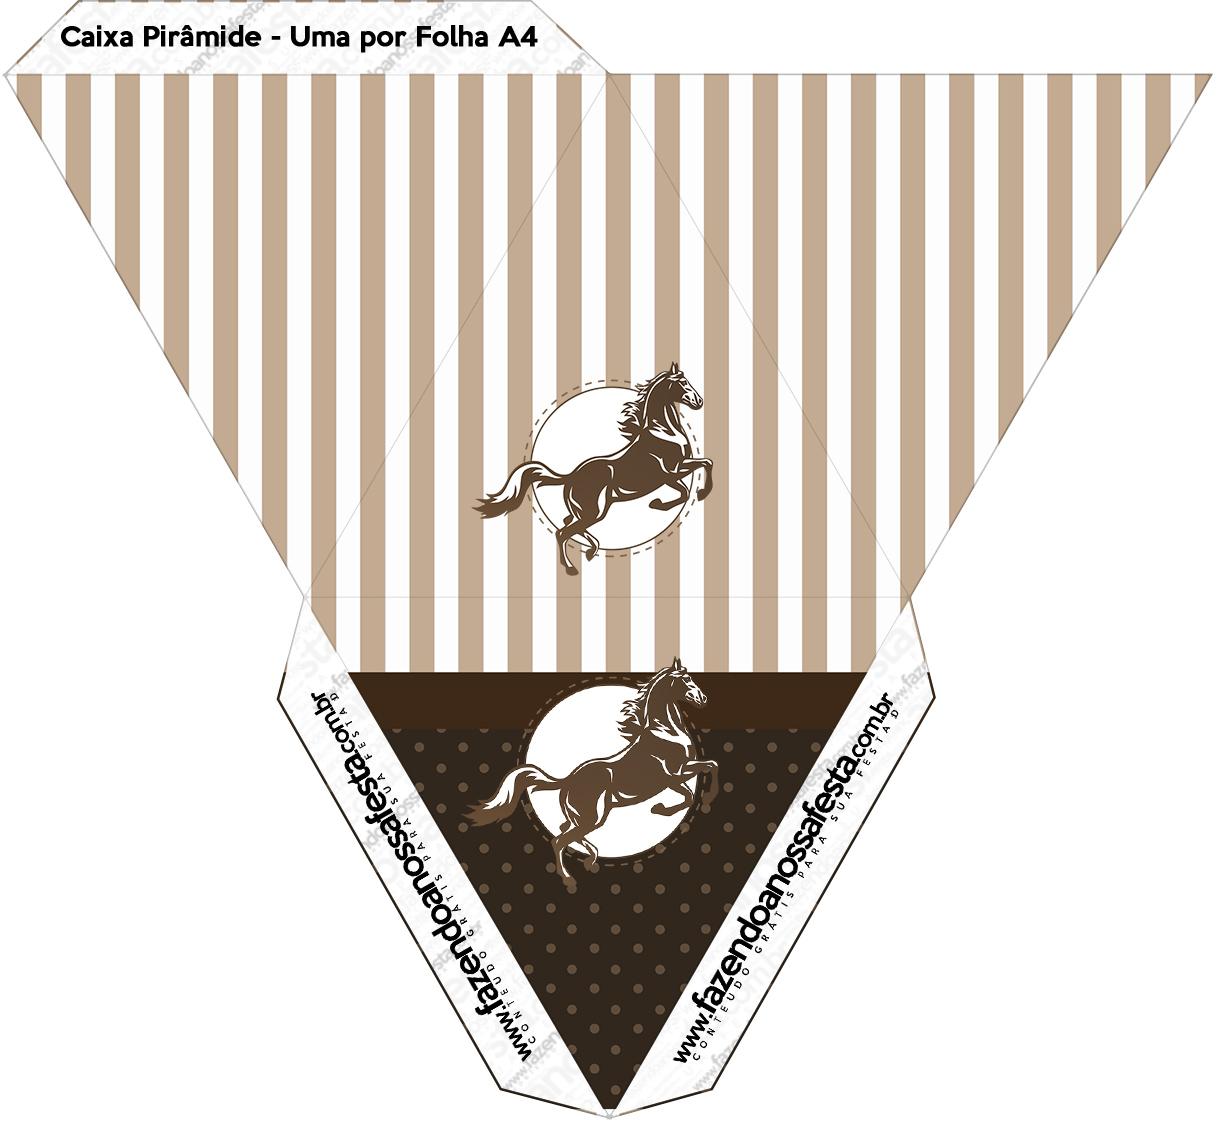 Caixa Pirâmide Cavalo 2